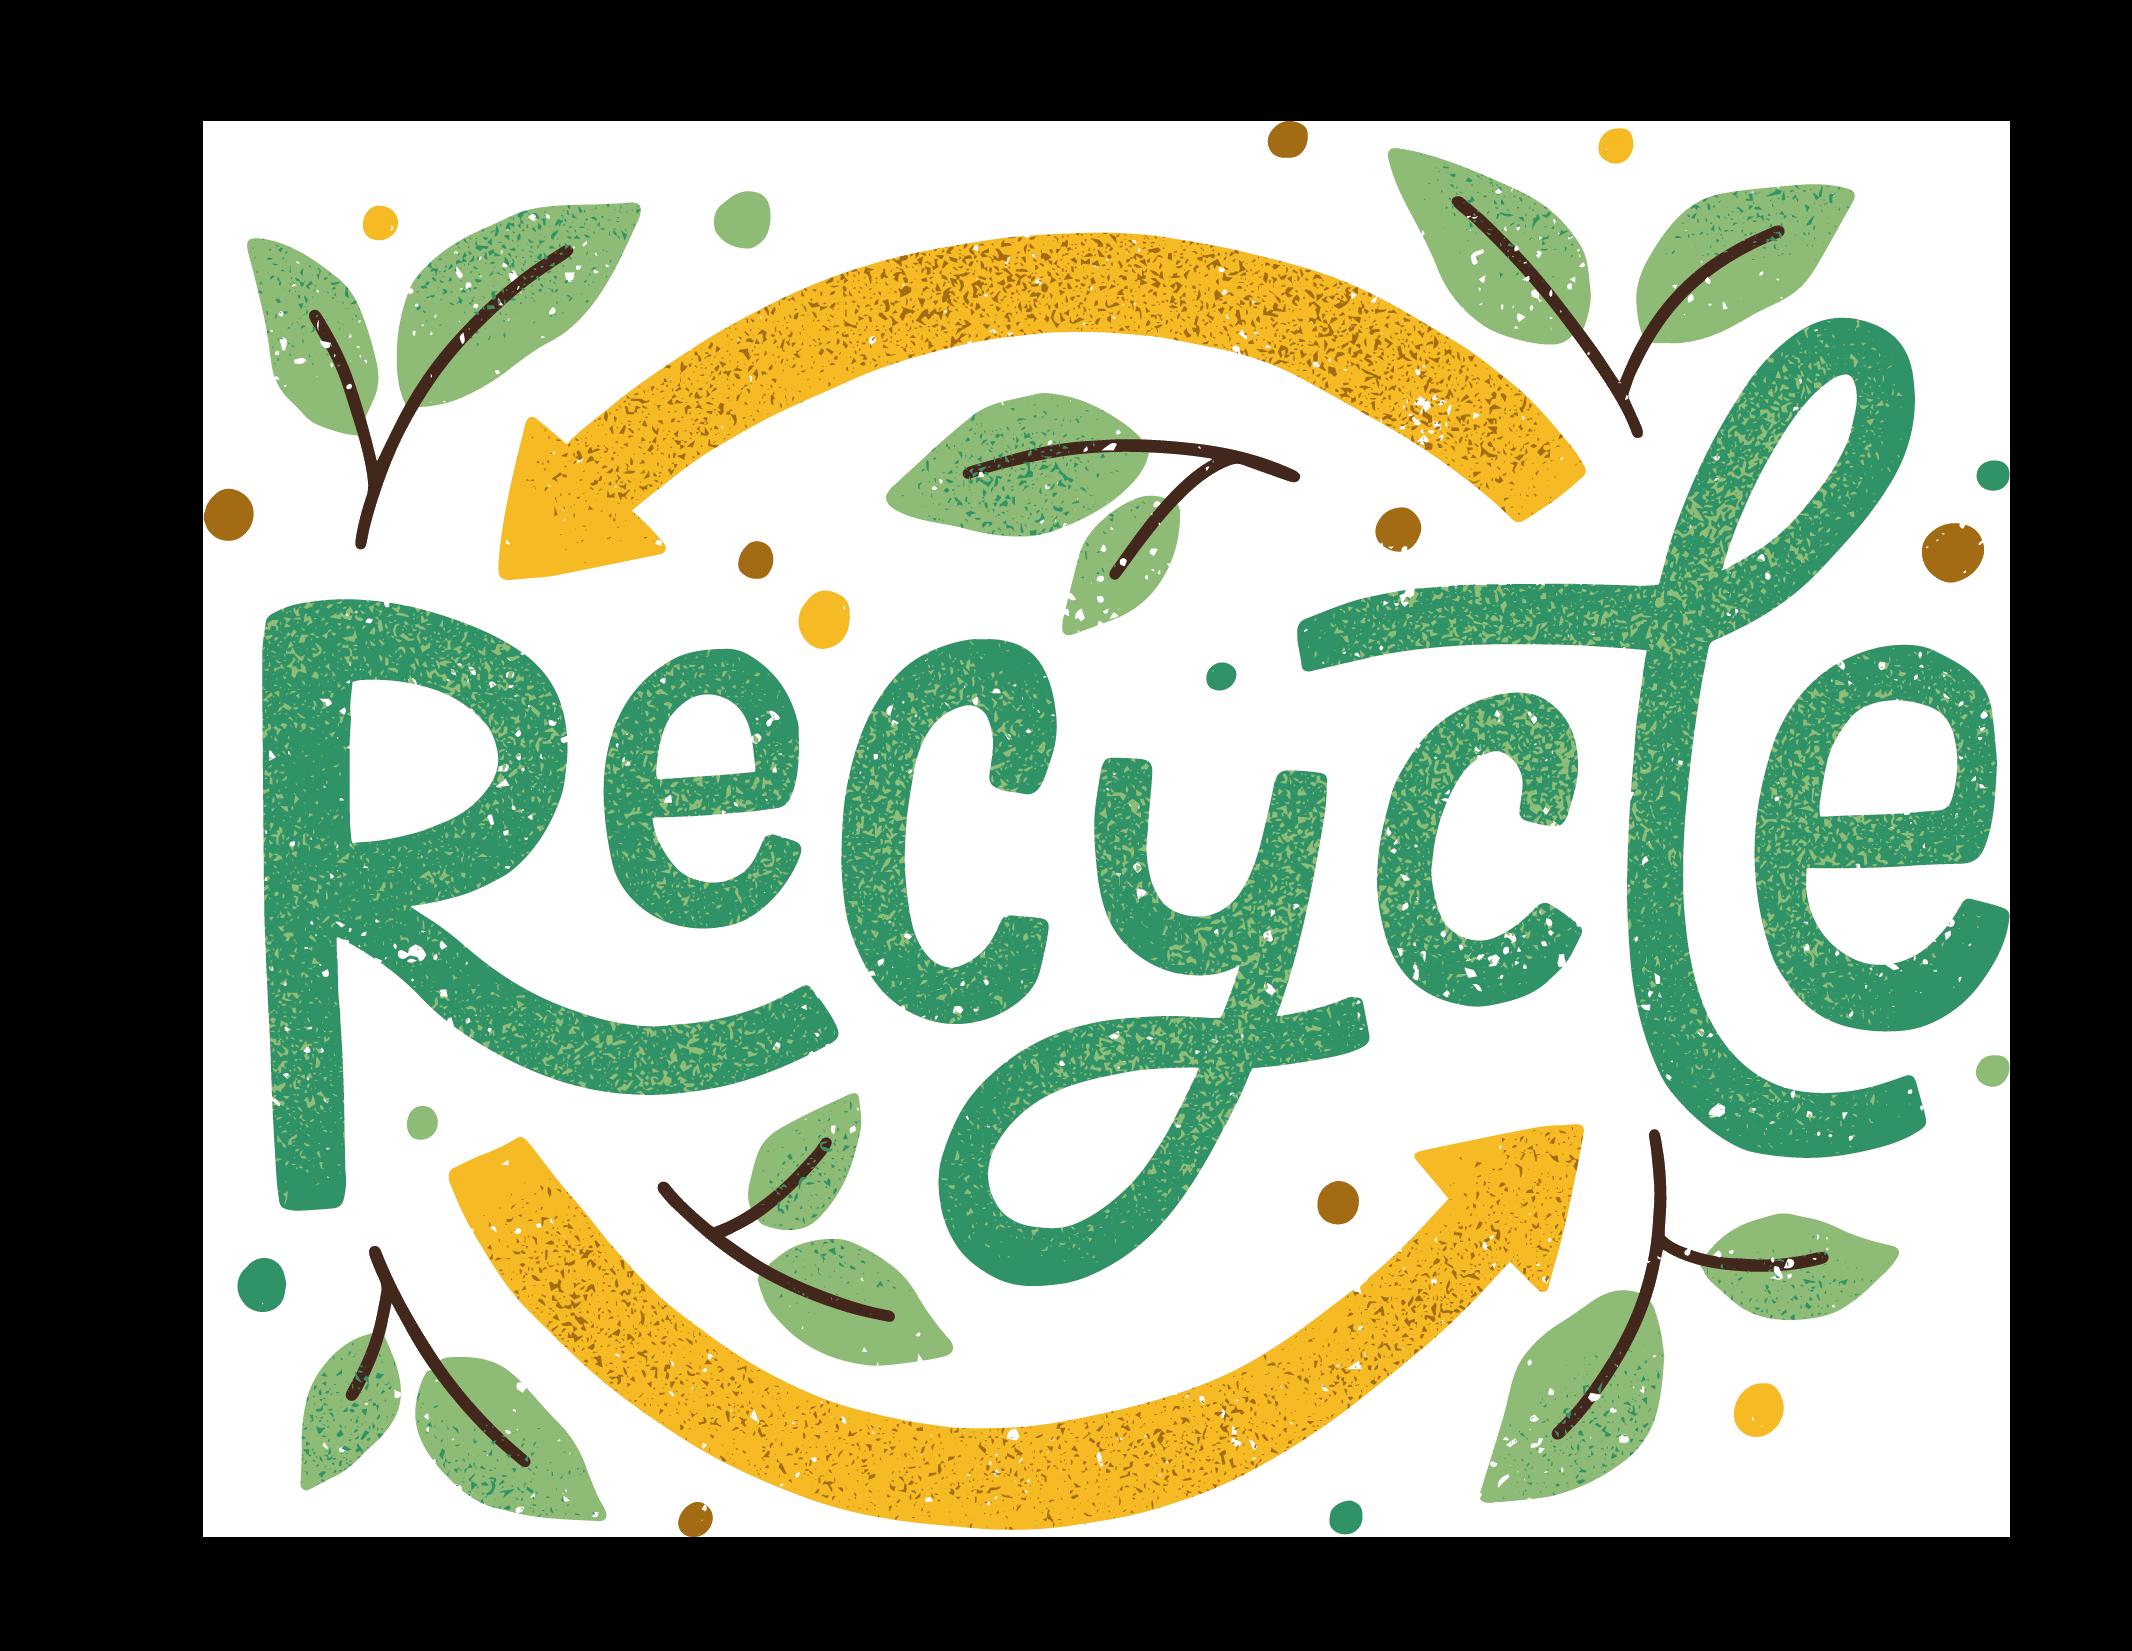 Wereld Recycling Dag